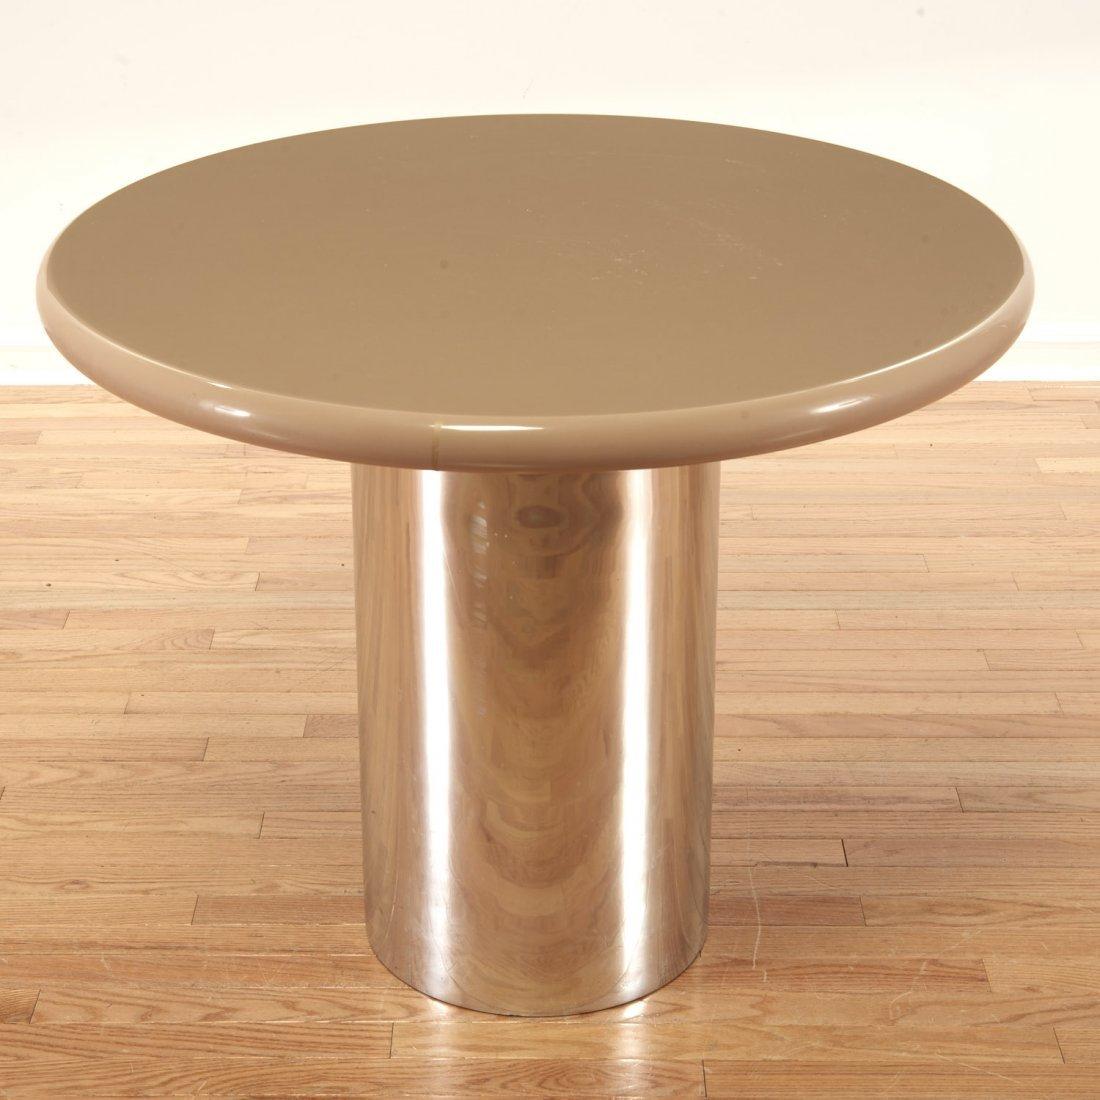 Karl Springer style chrome, acrylic dining table